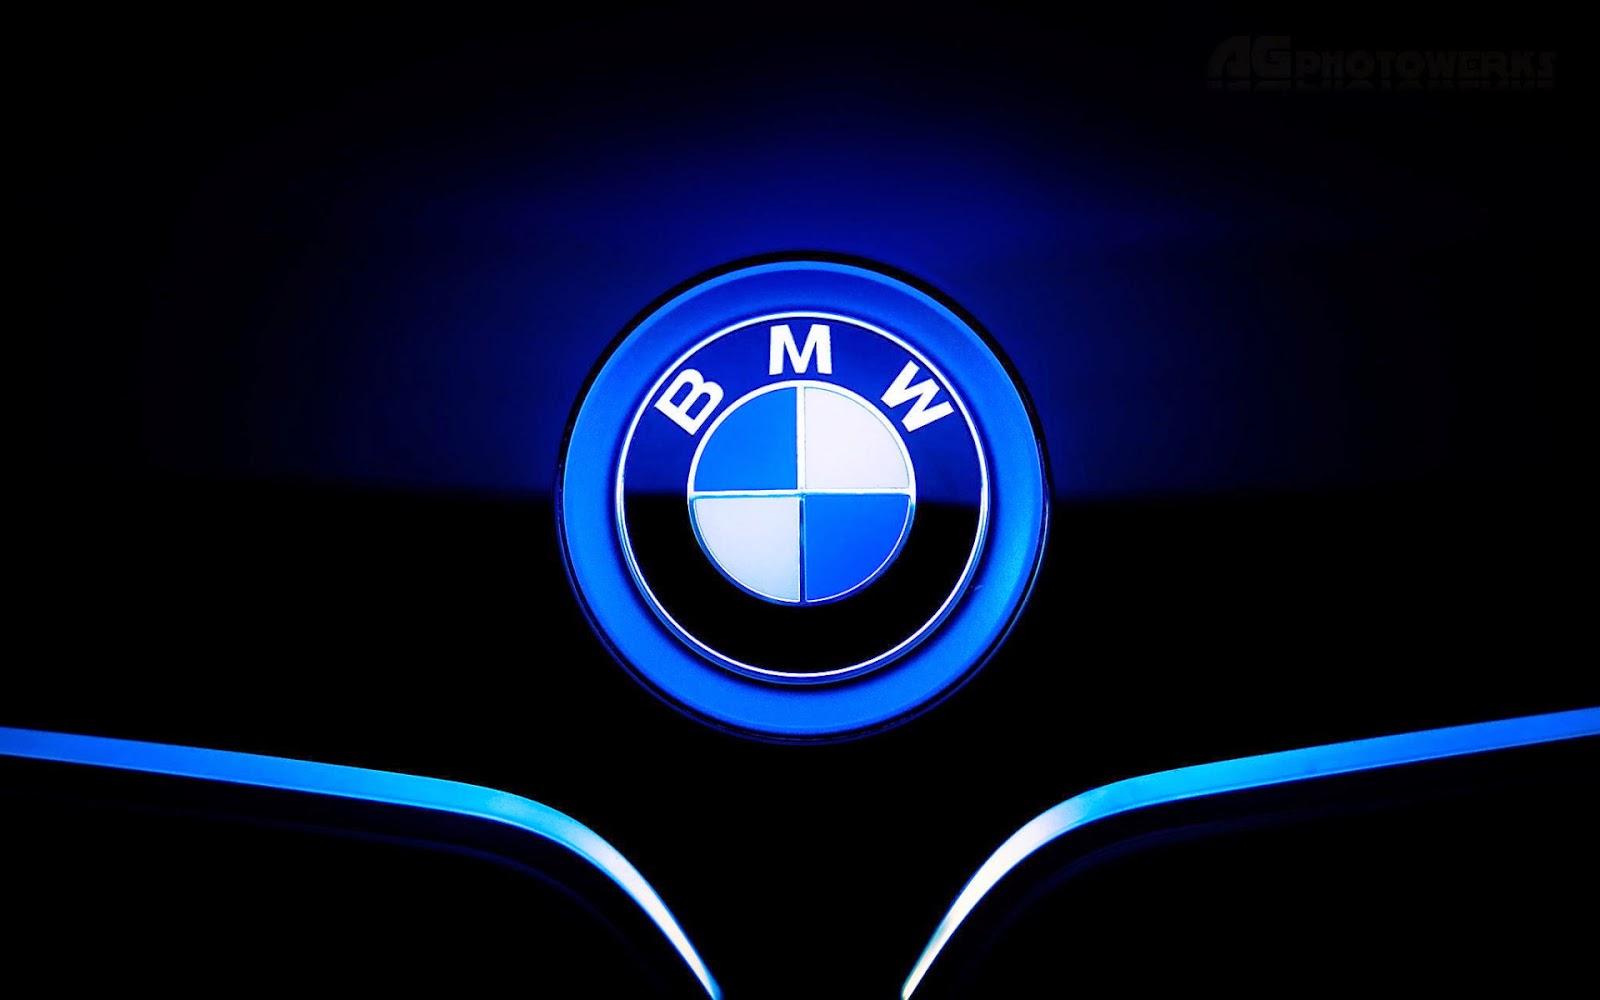 1600x1000 Bmw Bmw Car Logo Symbol Design Vector Png Free Download